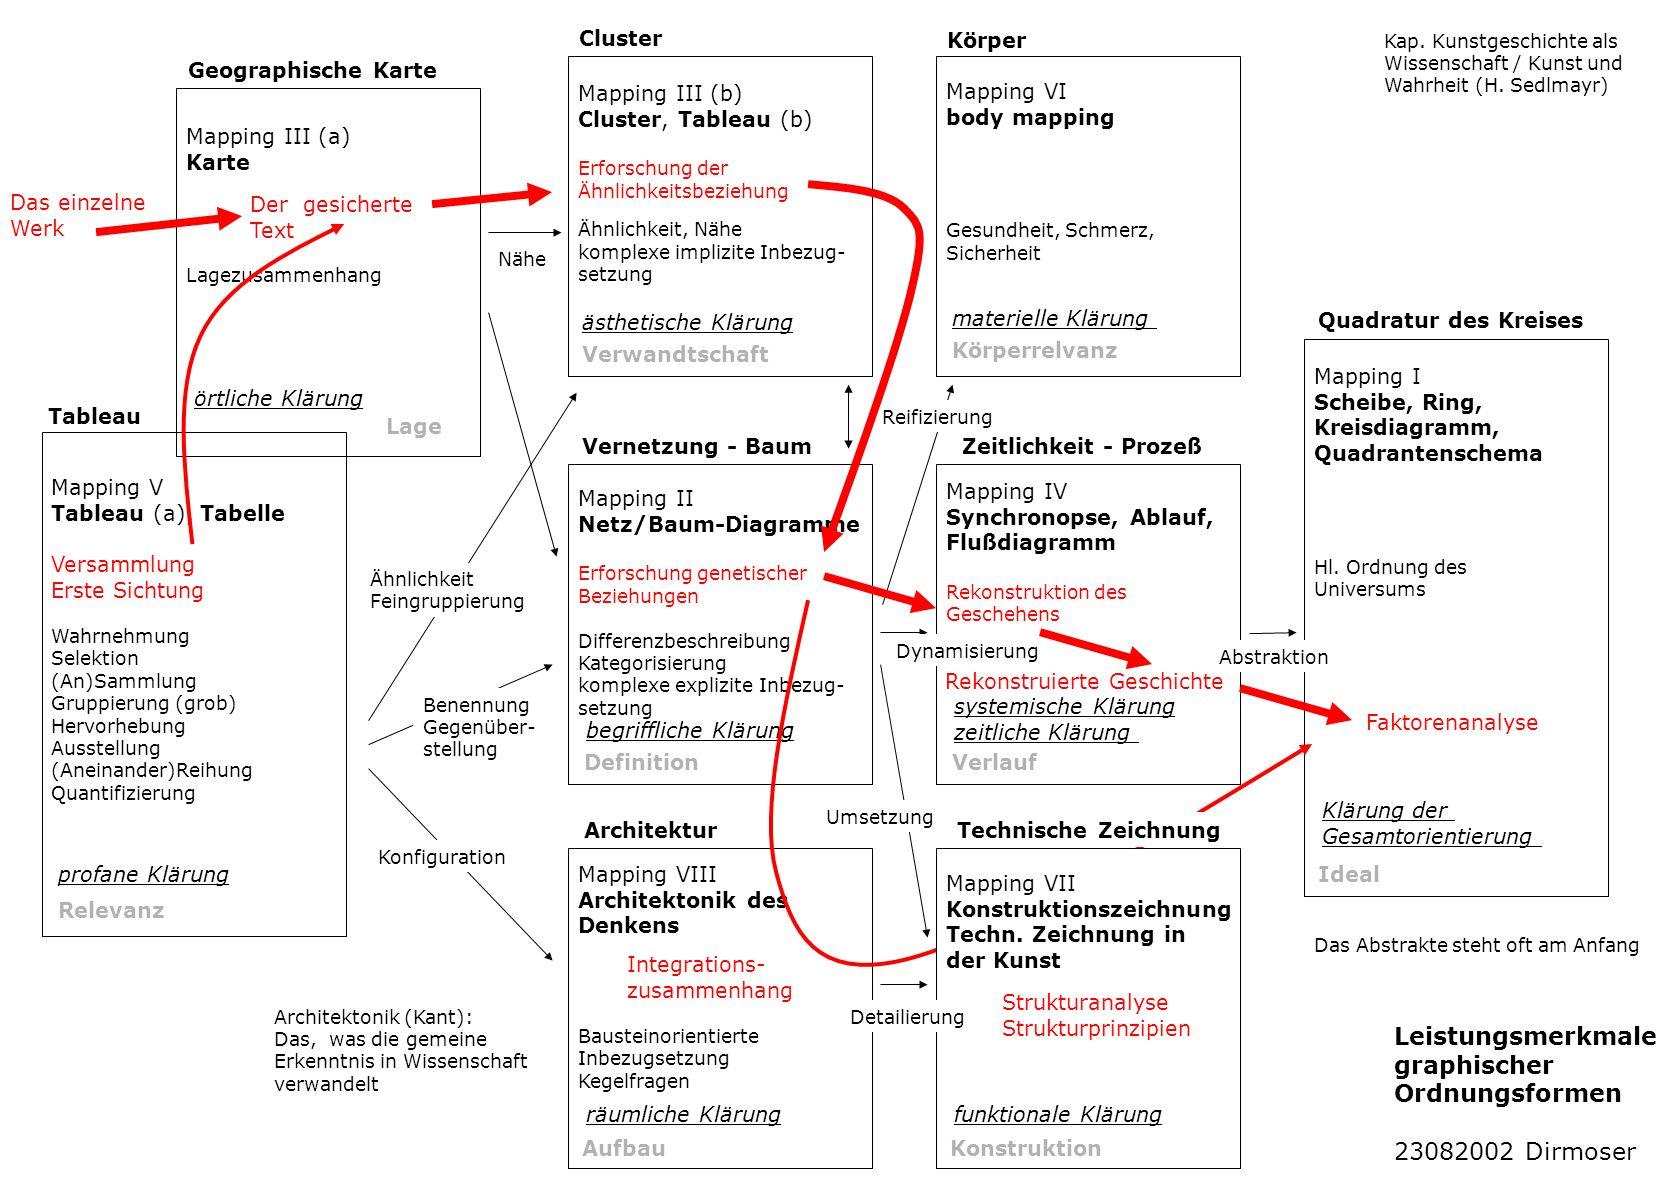 Mapping V Tableau (a), Tabelle Versammlung Erste Sichtung Wahrnehmung Selektion (An)Sammlung Gruppierung (grob) Hervorhebung Ausstellung (Aneinander)R